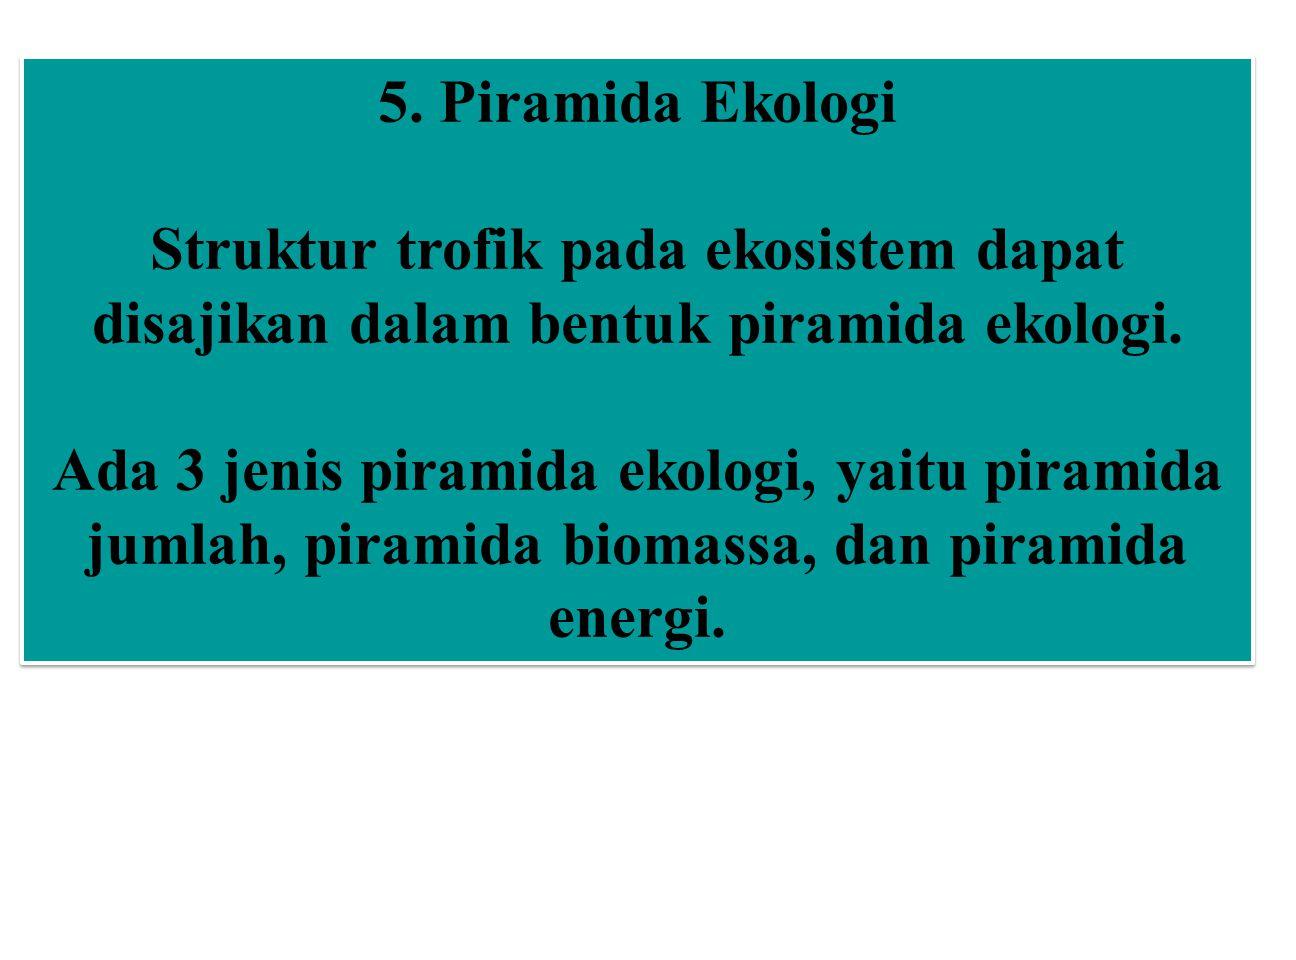 5. Piramida Ekologi Struktur trofik pada ekosistem dapat disajikan dalam bentuk piramida ekologi.